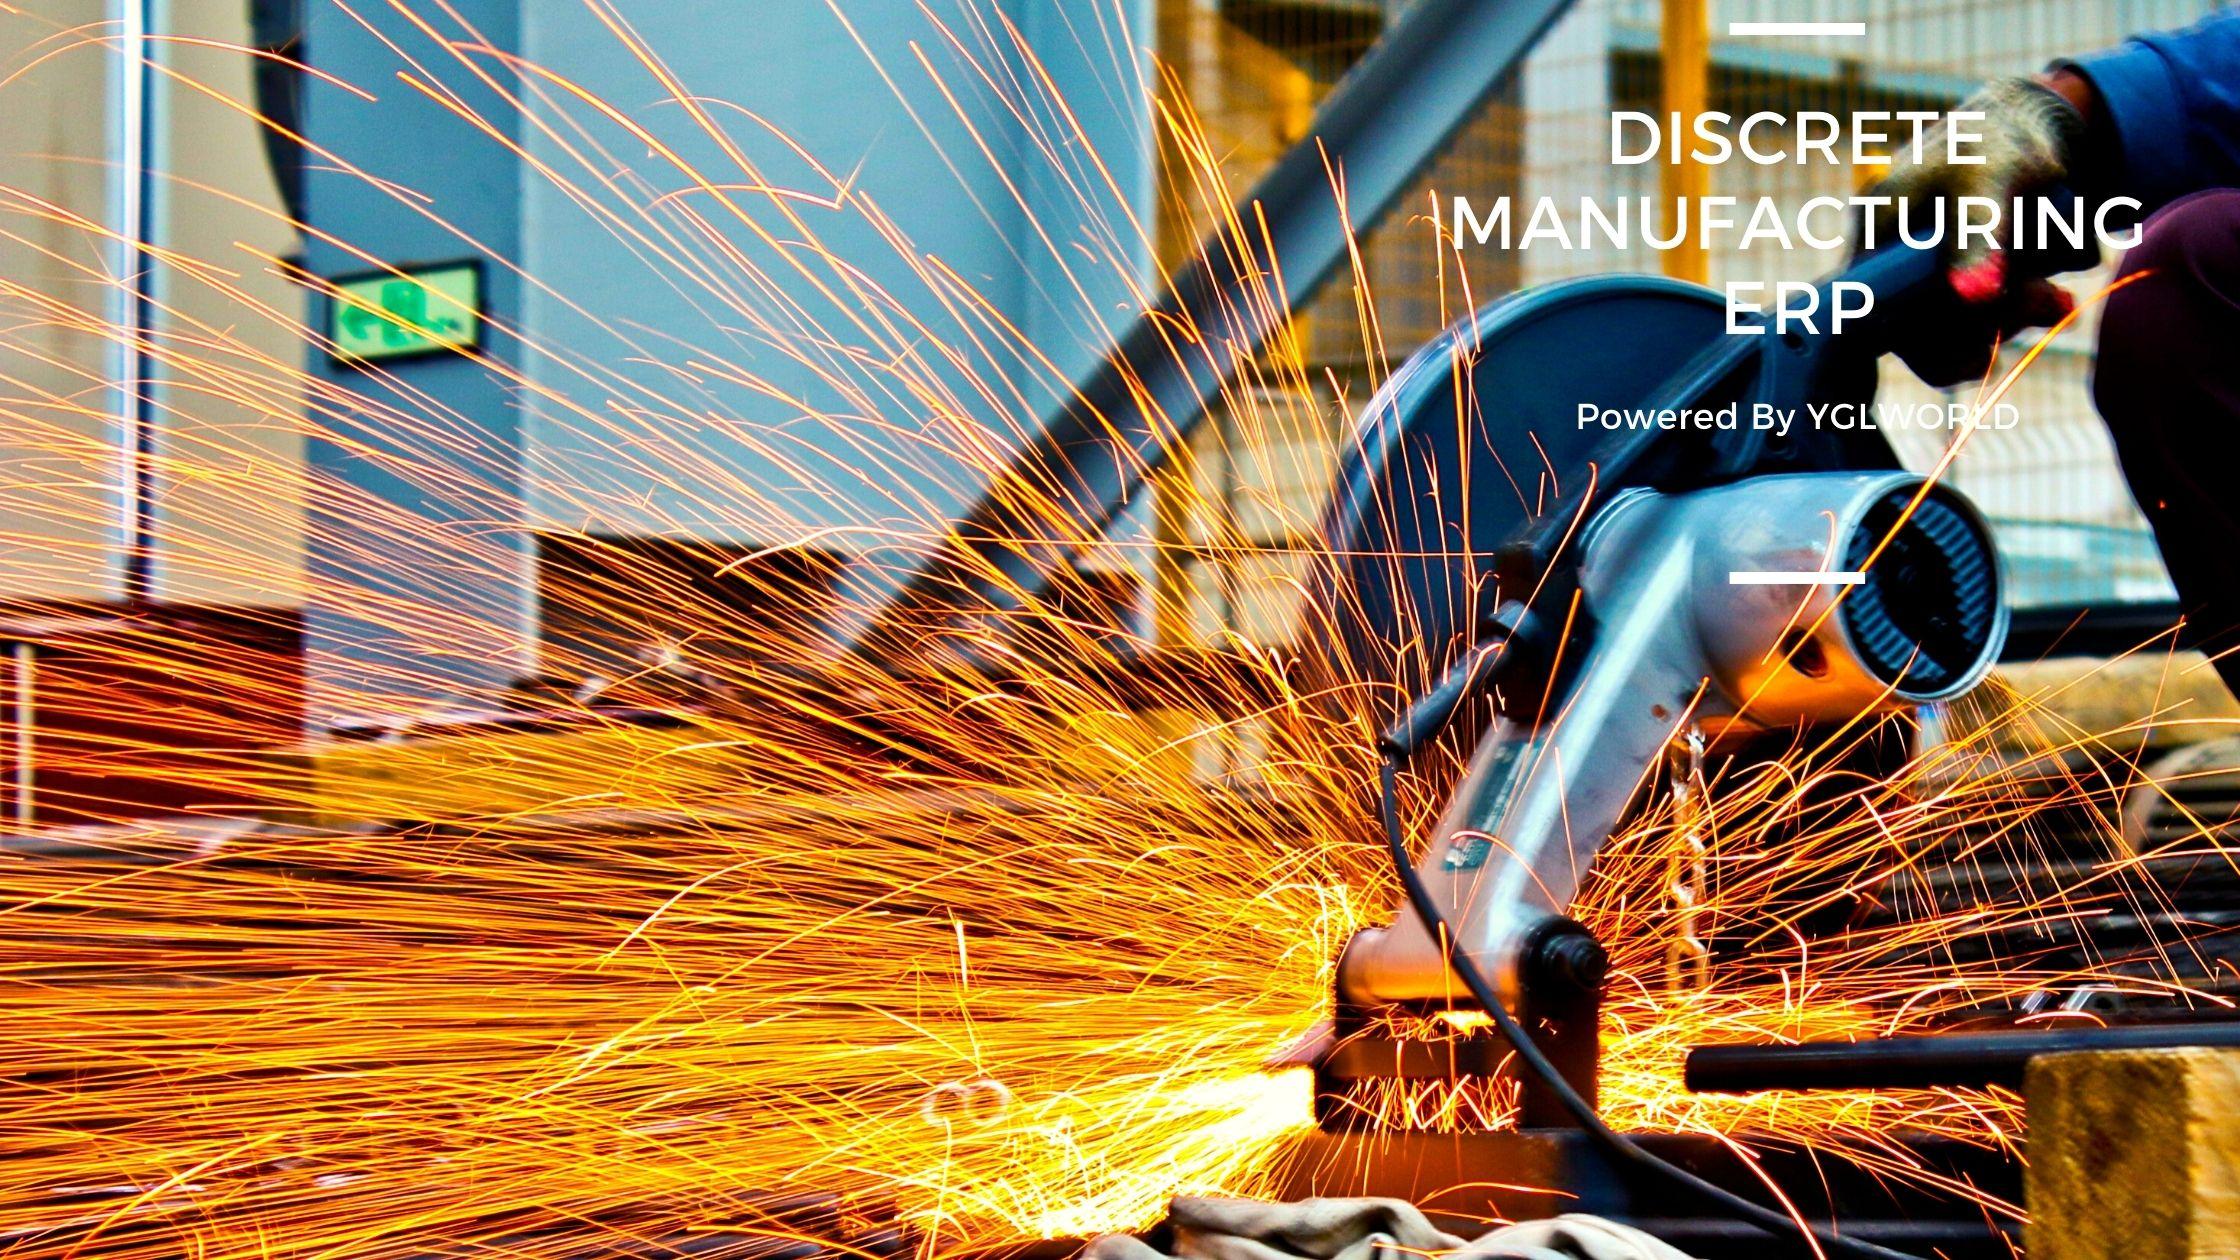 Discrete manufacturing ERP4.0 | YGL Beyond ERP